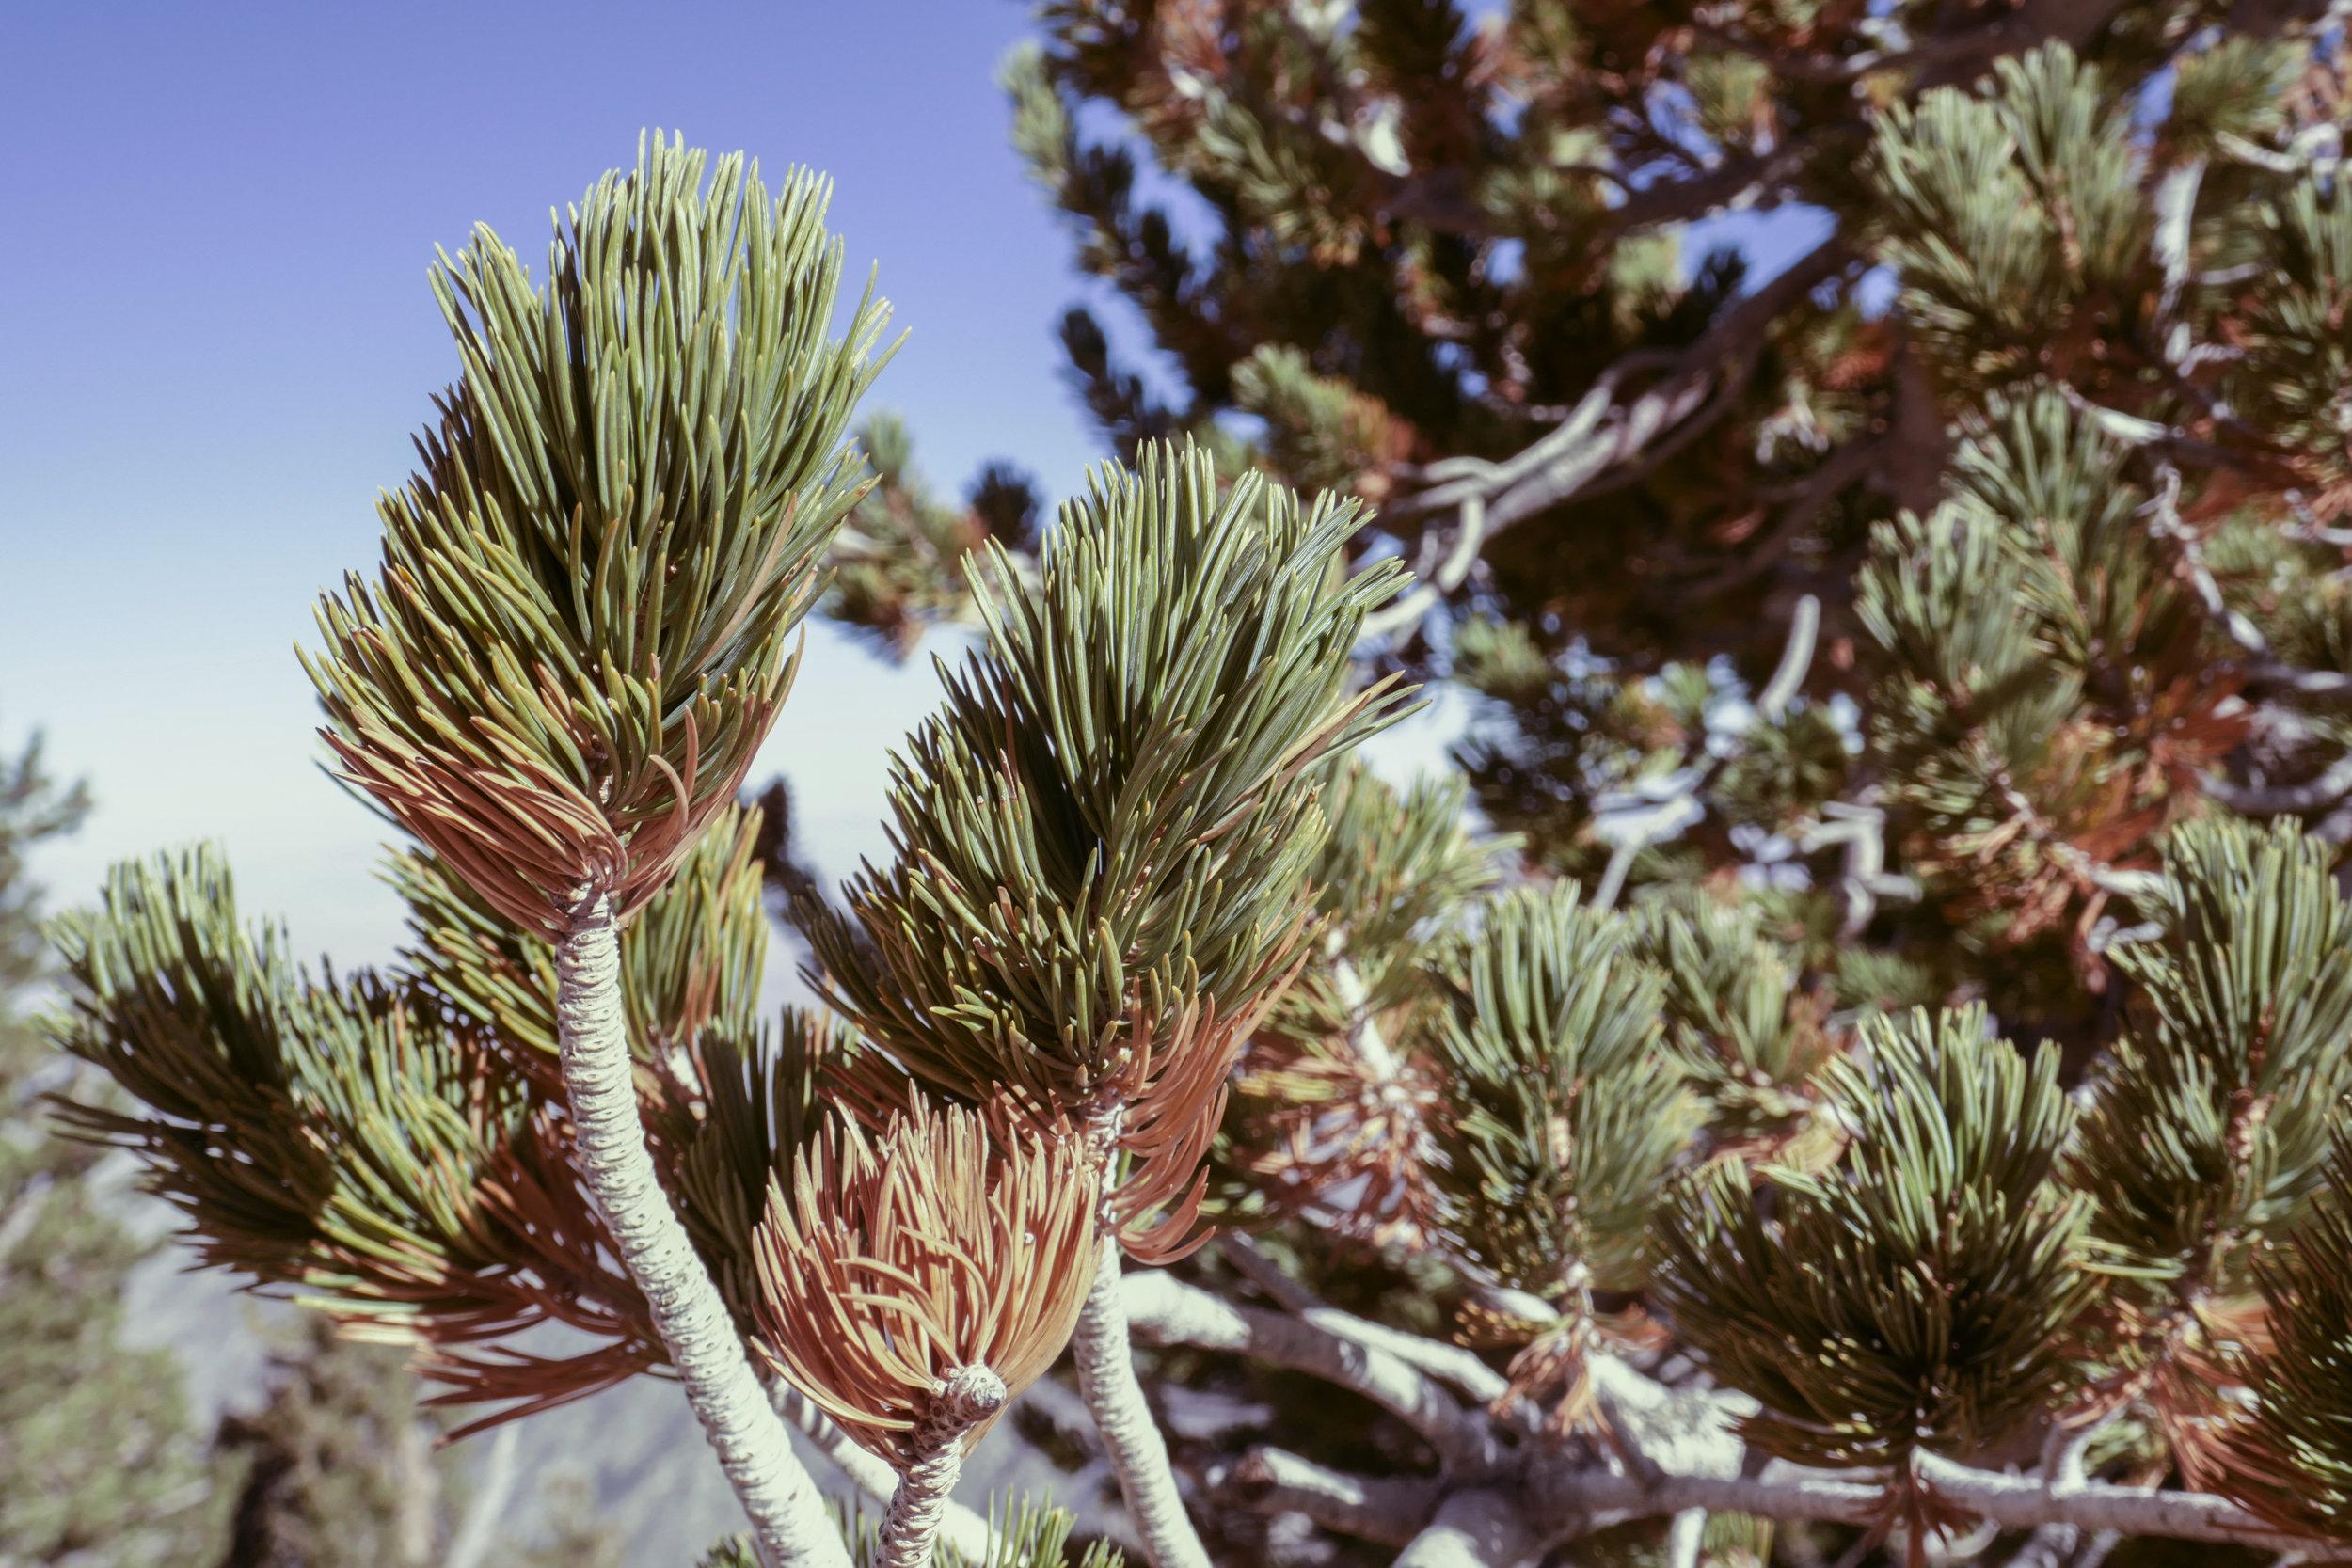 Close up of a limber pine.